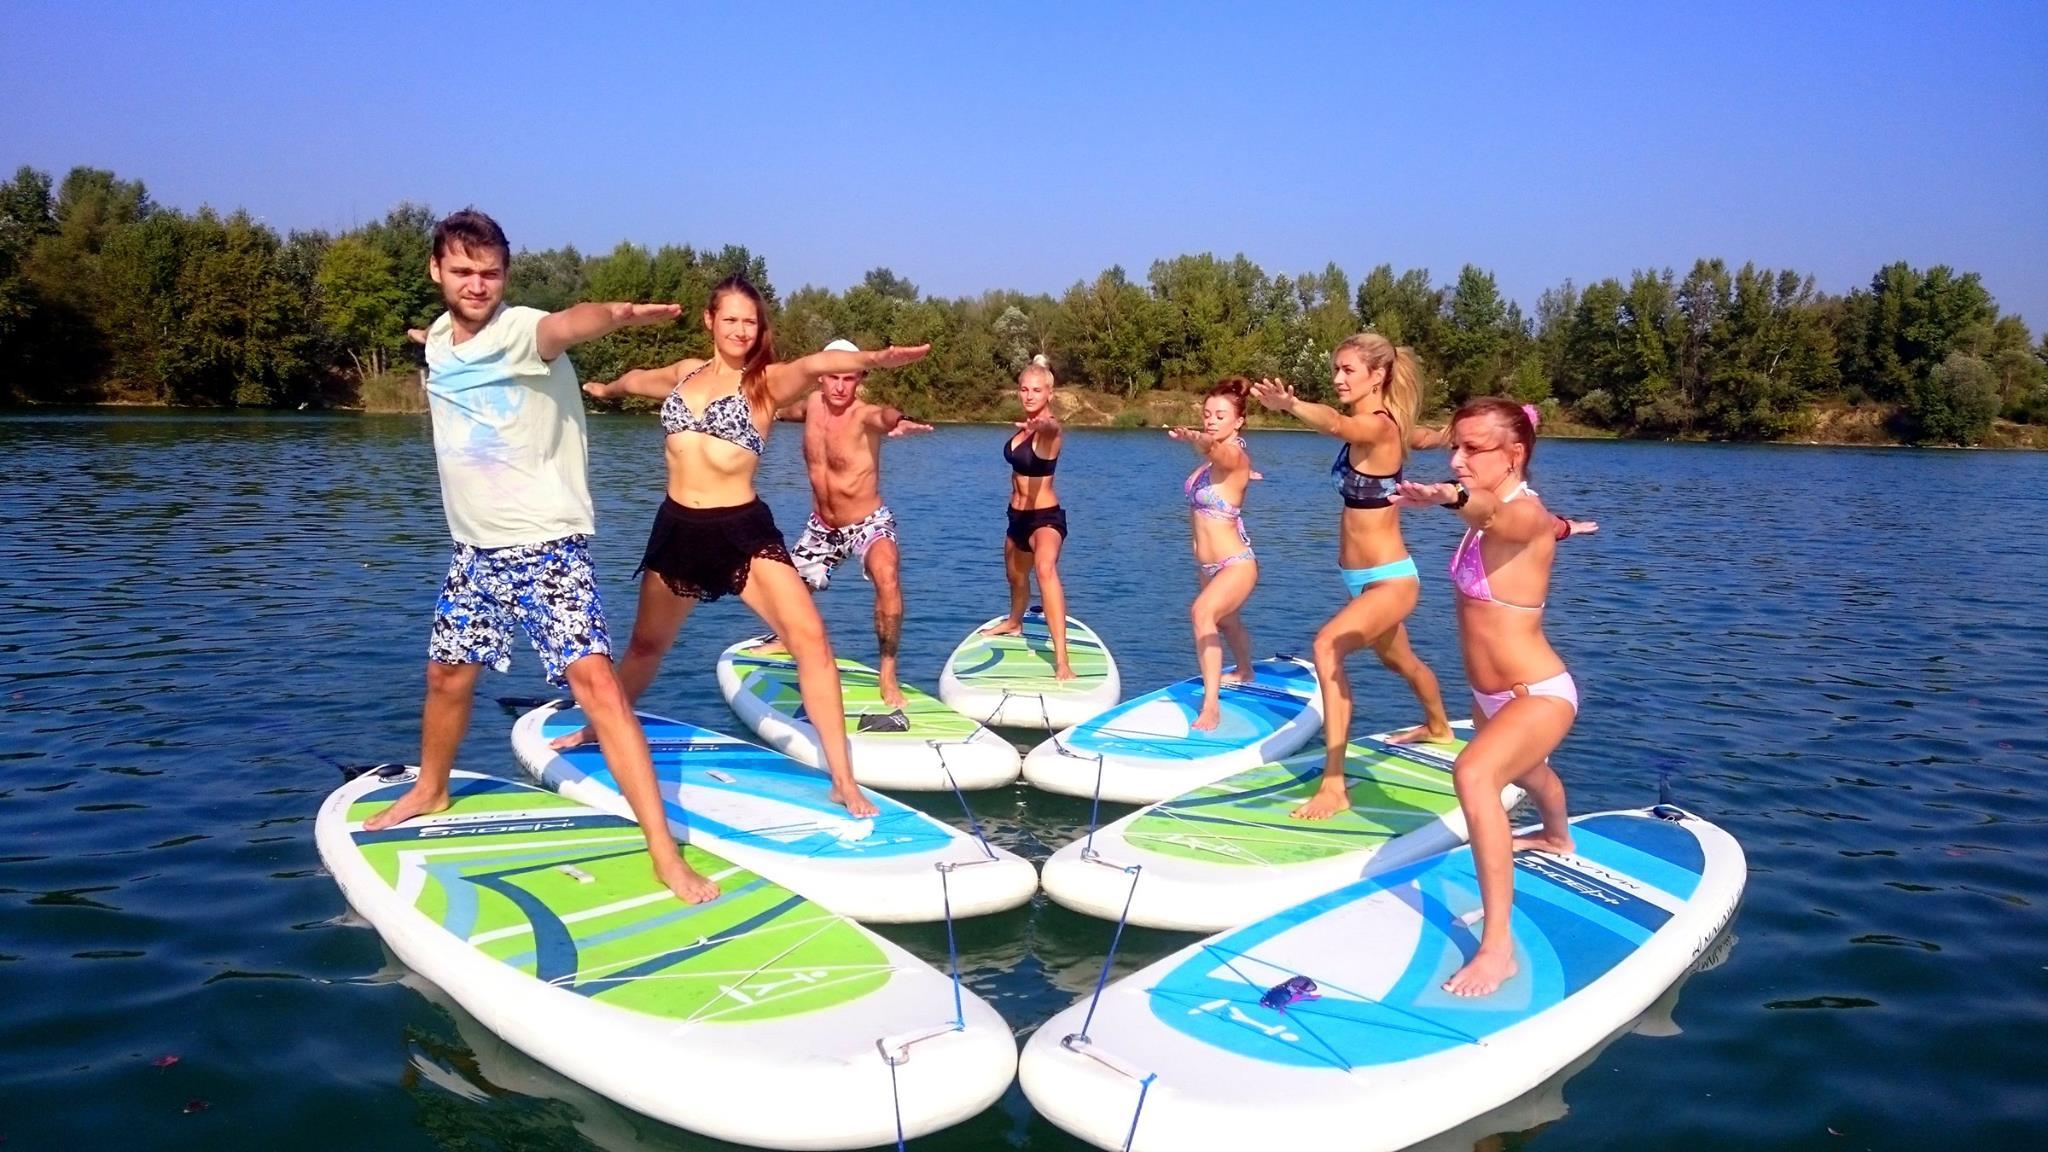 joga-na-paddleboarde-neonmars-7